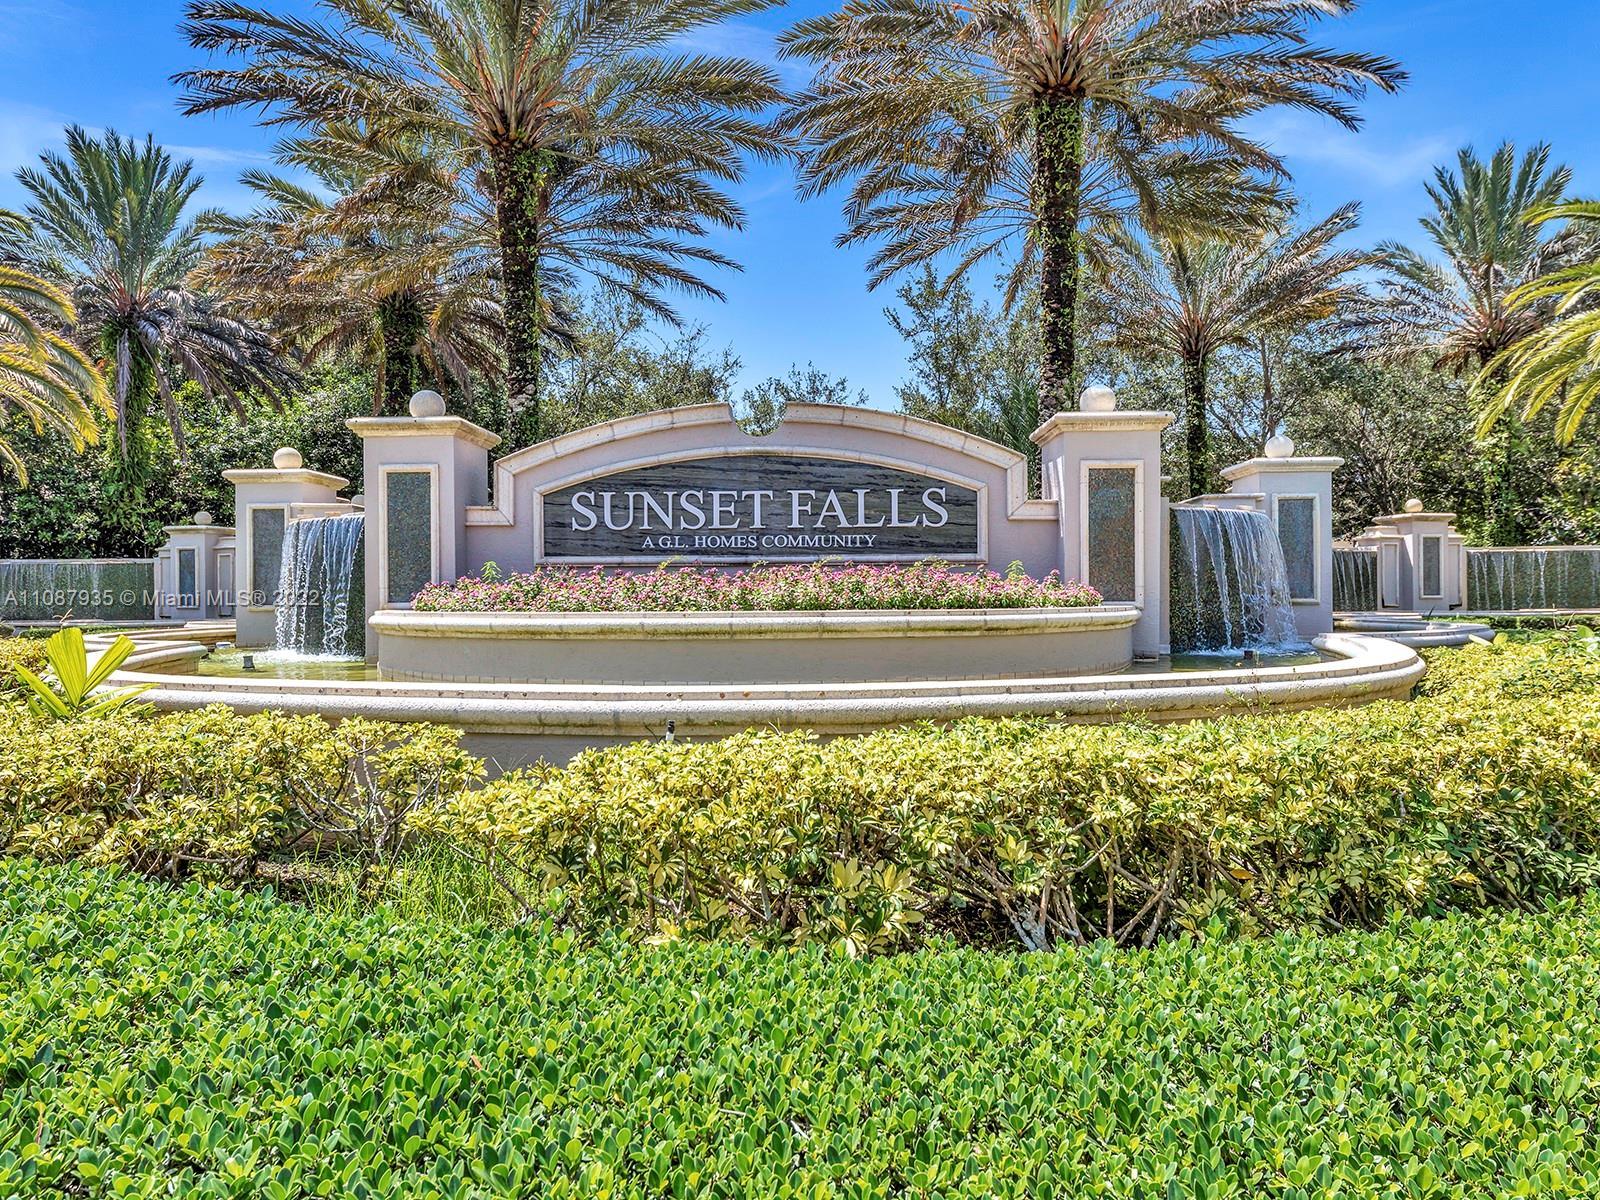 17724 47th St, Miramar, Florida 33029